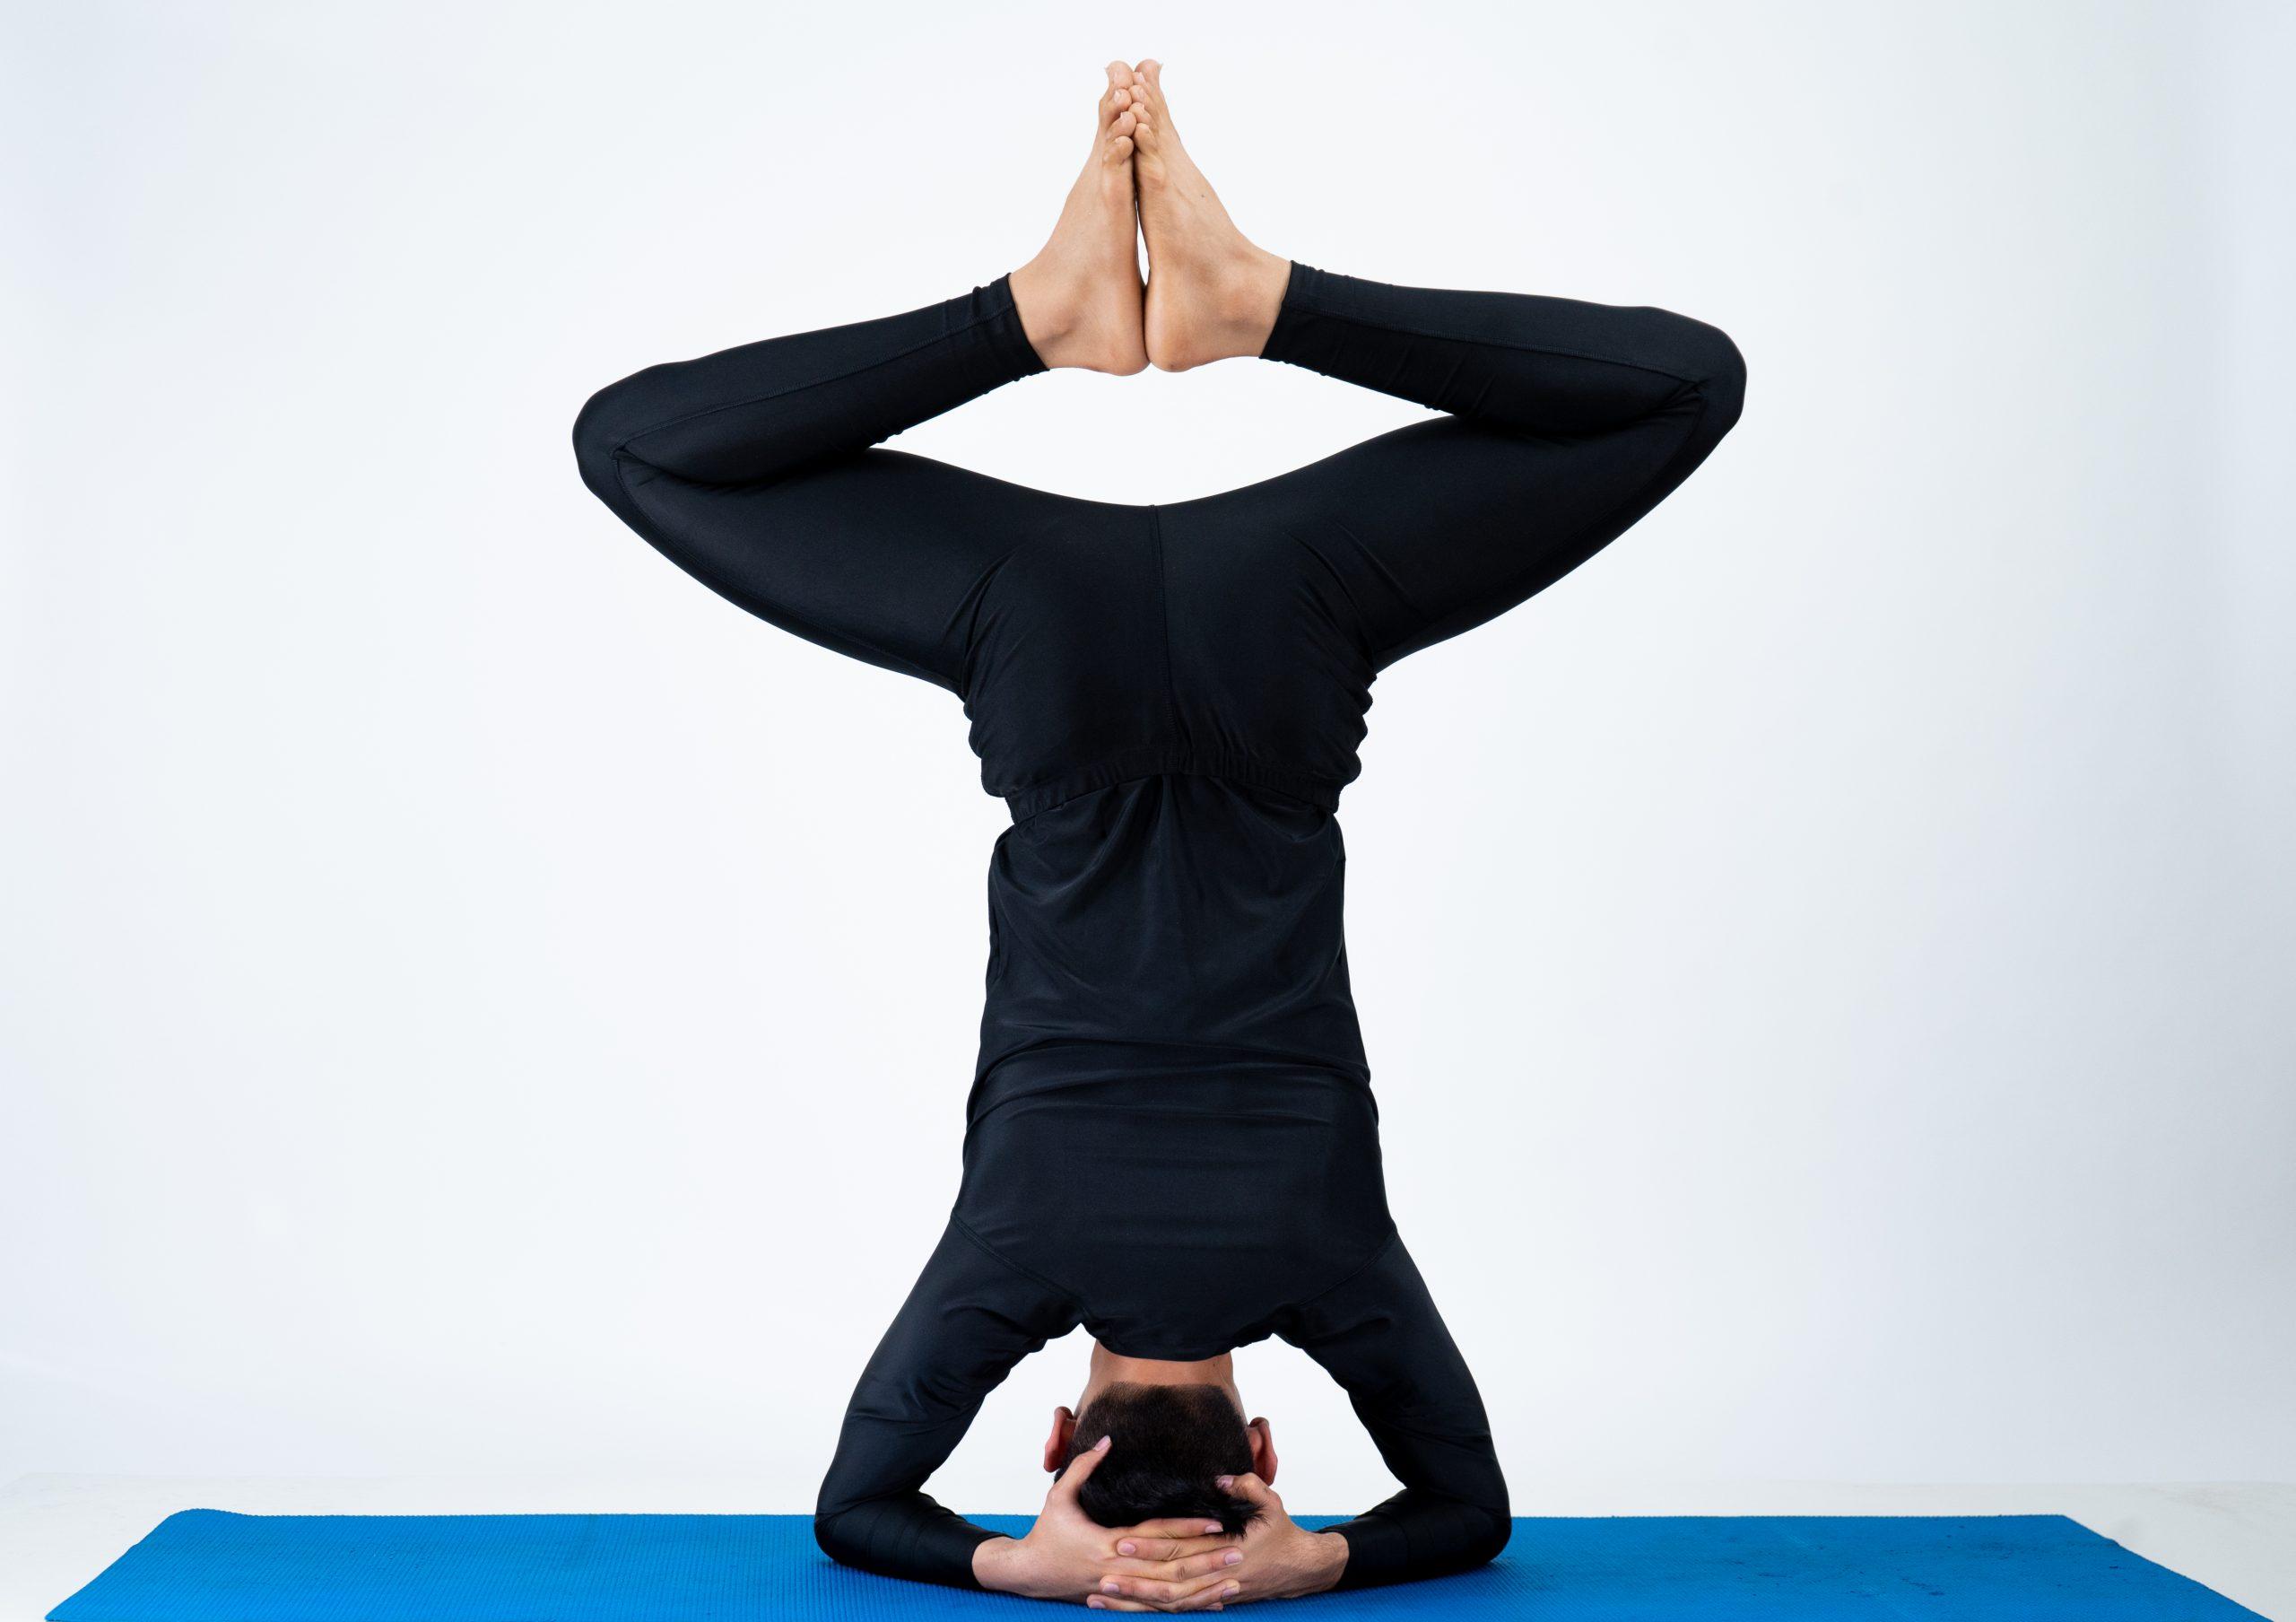 Baddha Kona Sirsasana (Bound Angle Headstand Pose)